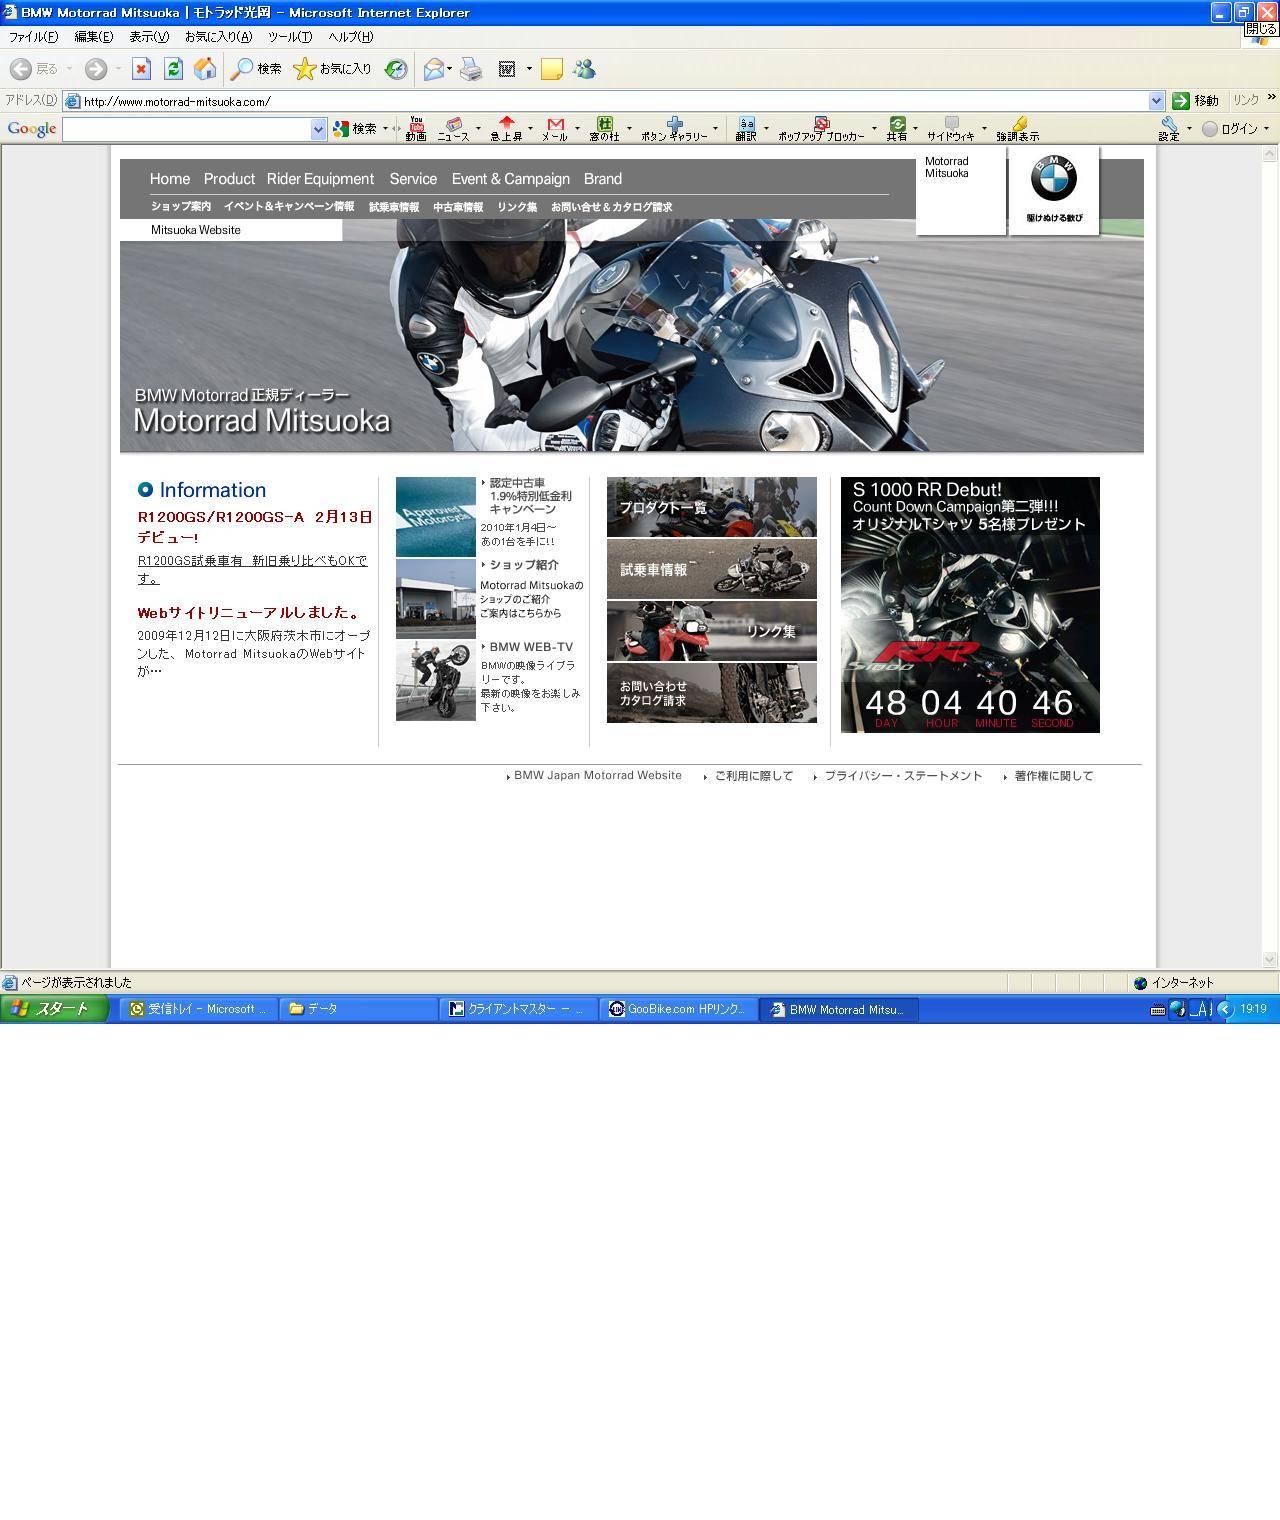 Motorrad Mitsuoka 名古屋 (株)光岡自動車